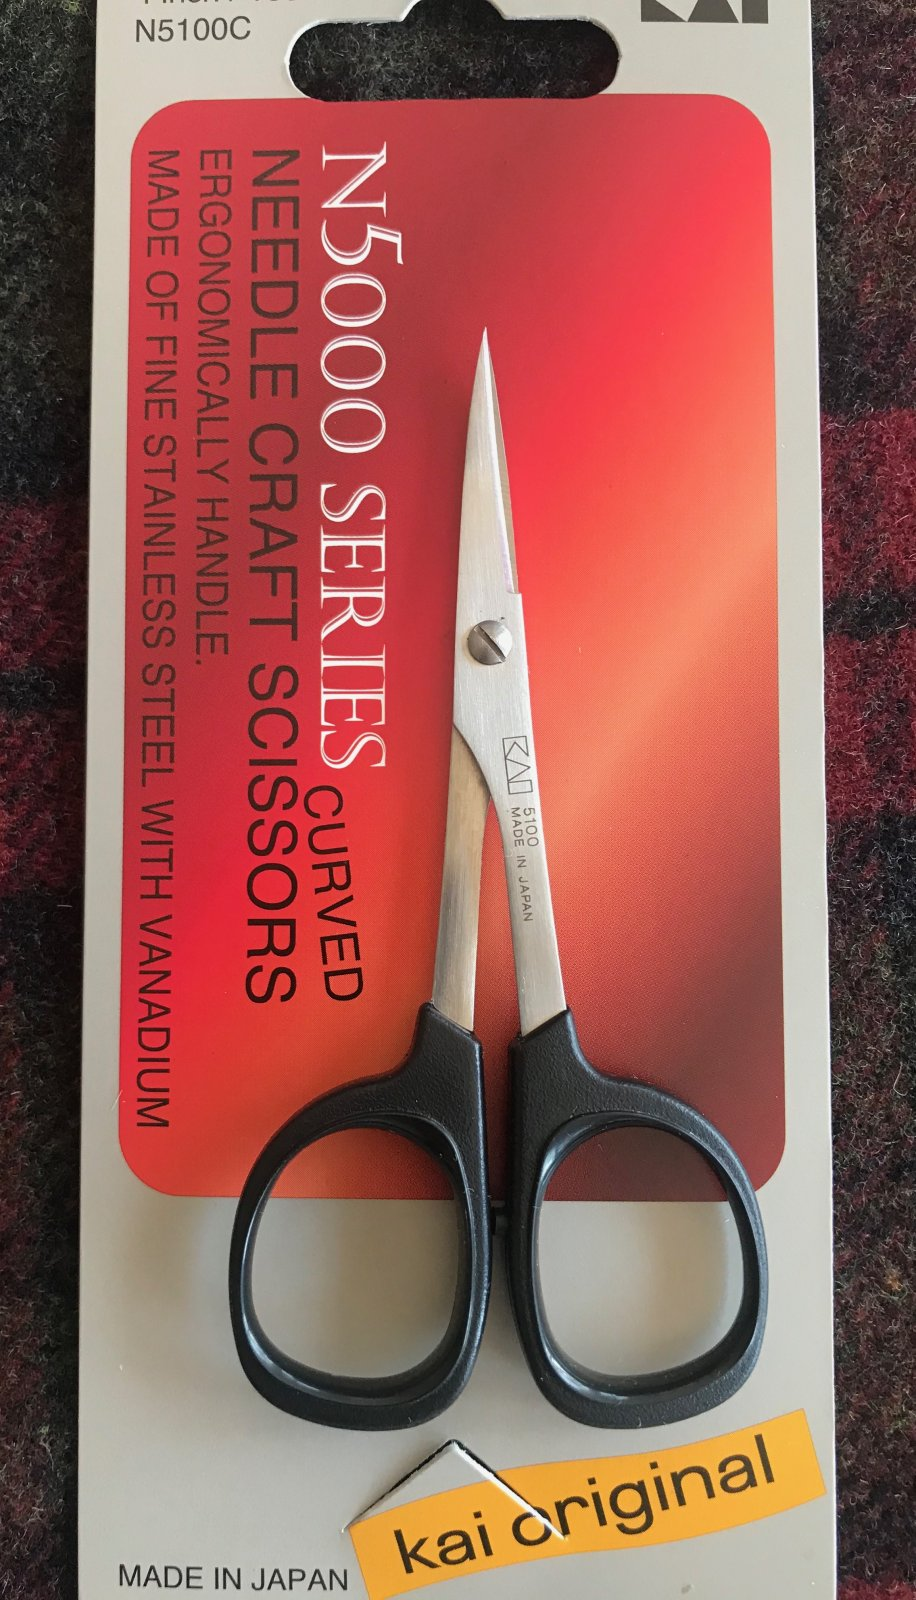 Kai Needle Craft Scissors 4 Inch Curved Blade